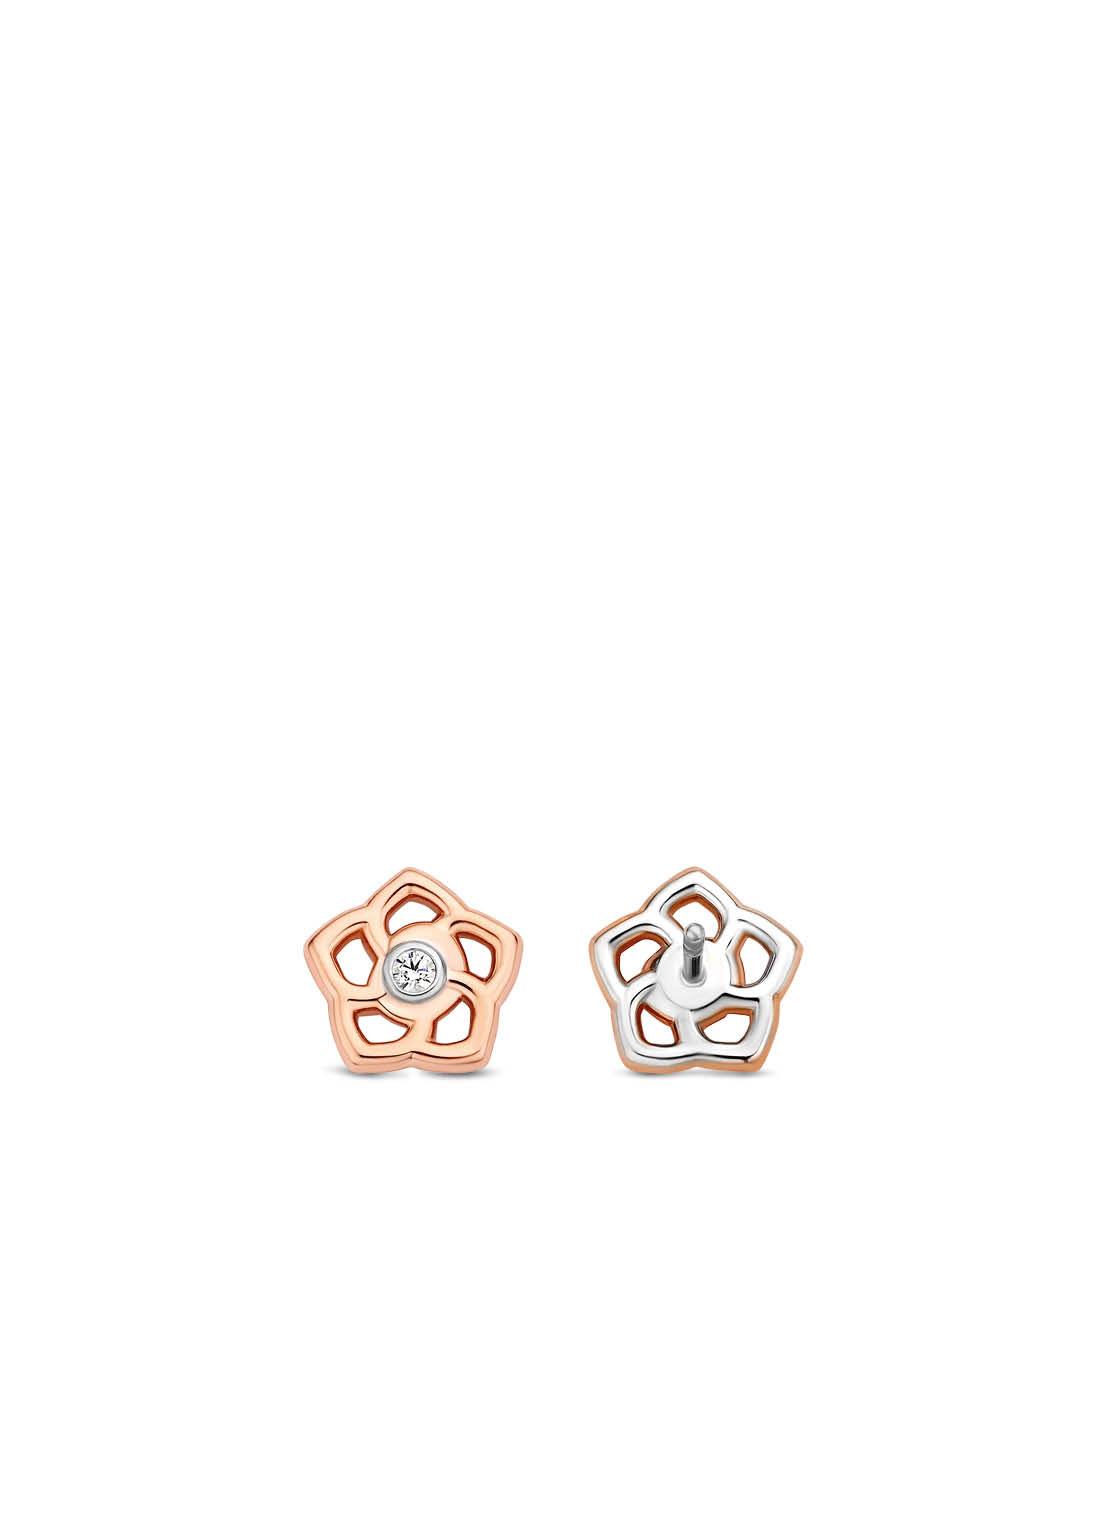 TI SENTO - Milano Earrings 7809ZR-4